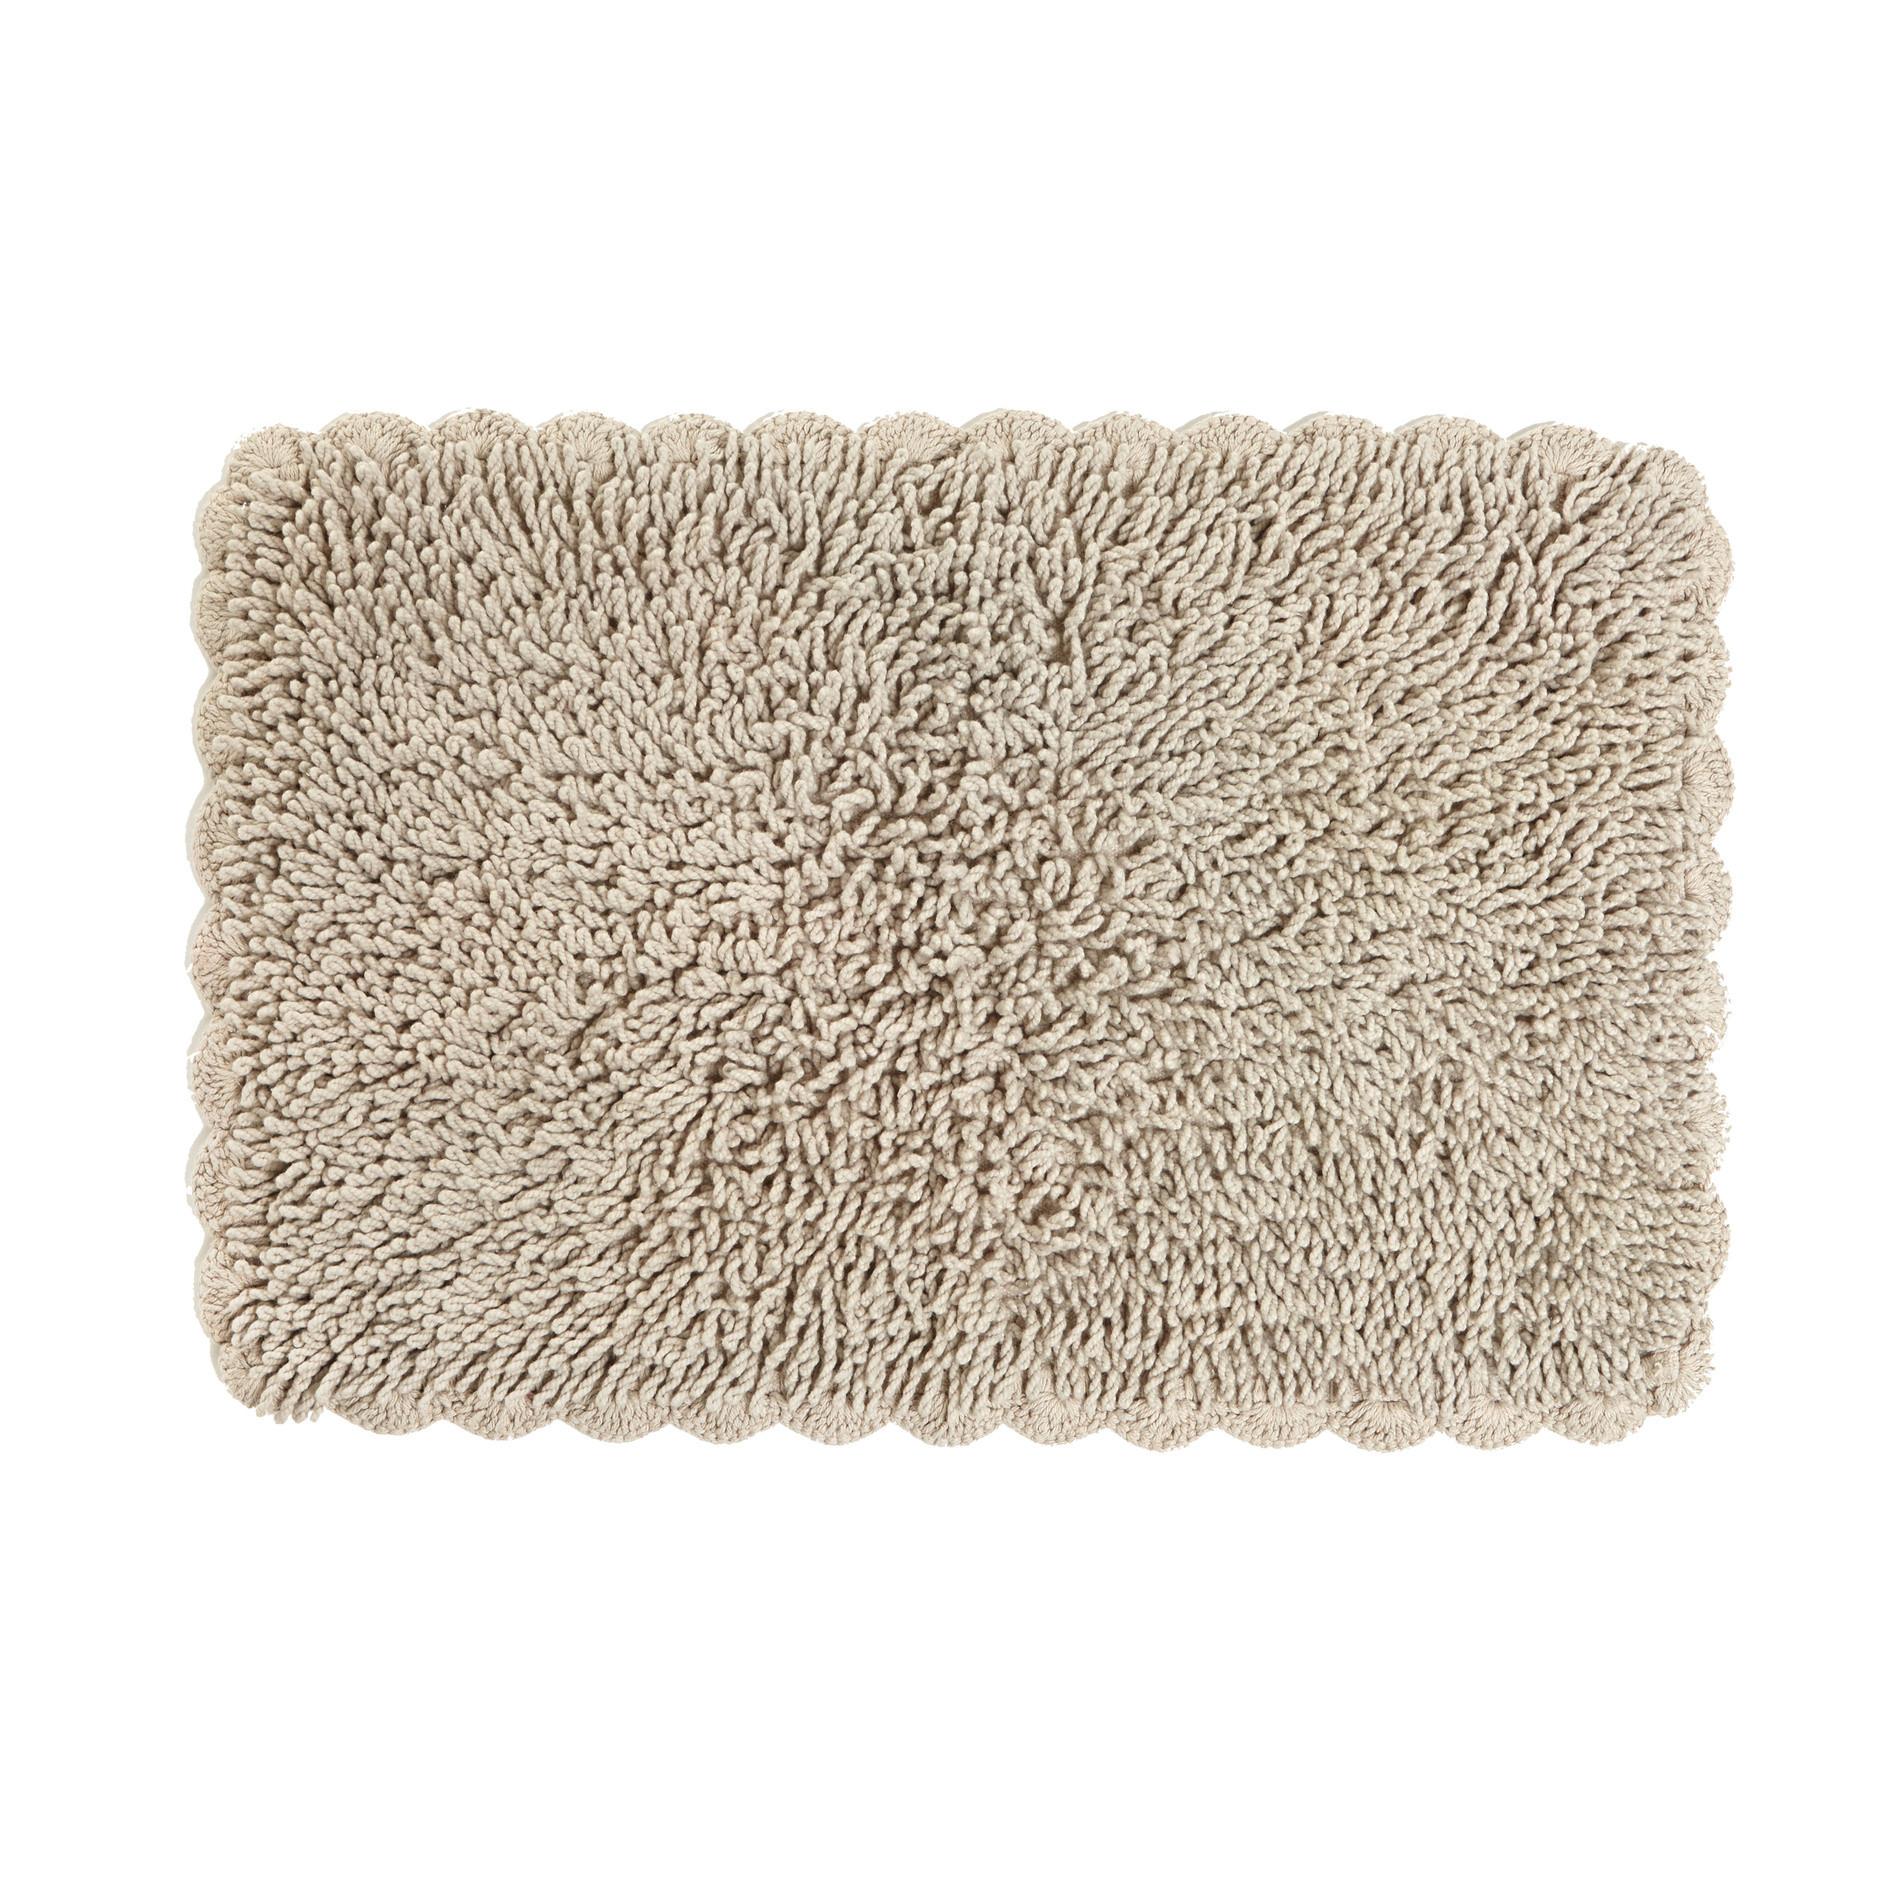 Tappeto bagno con crochet, Beige, large image number 0